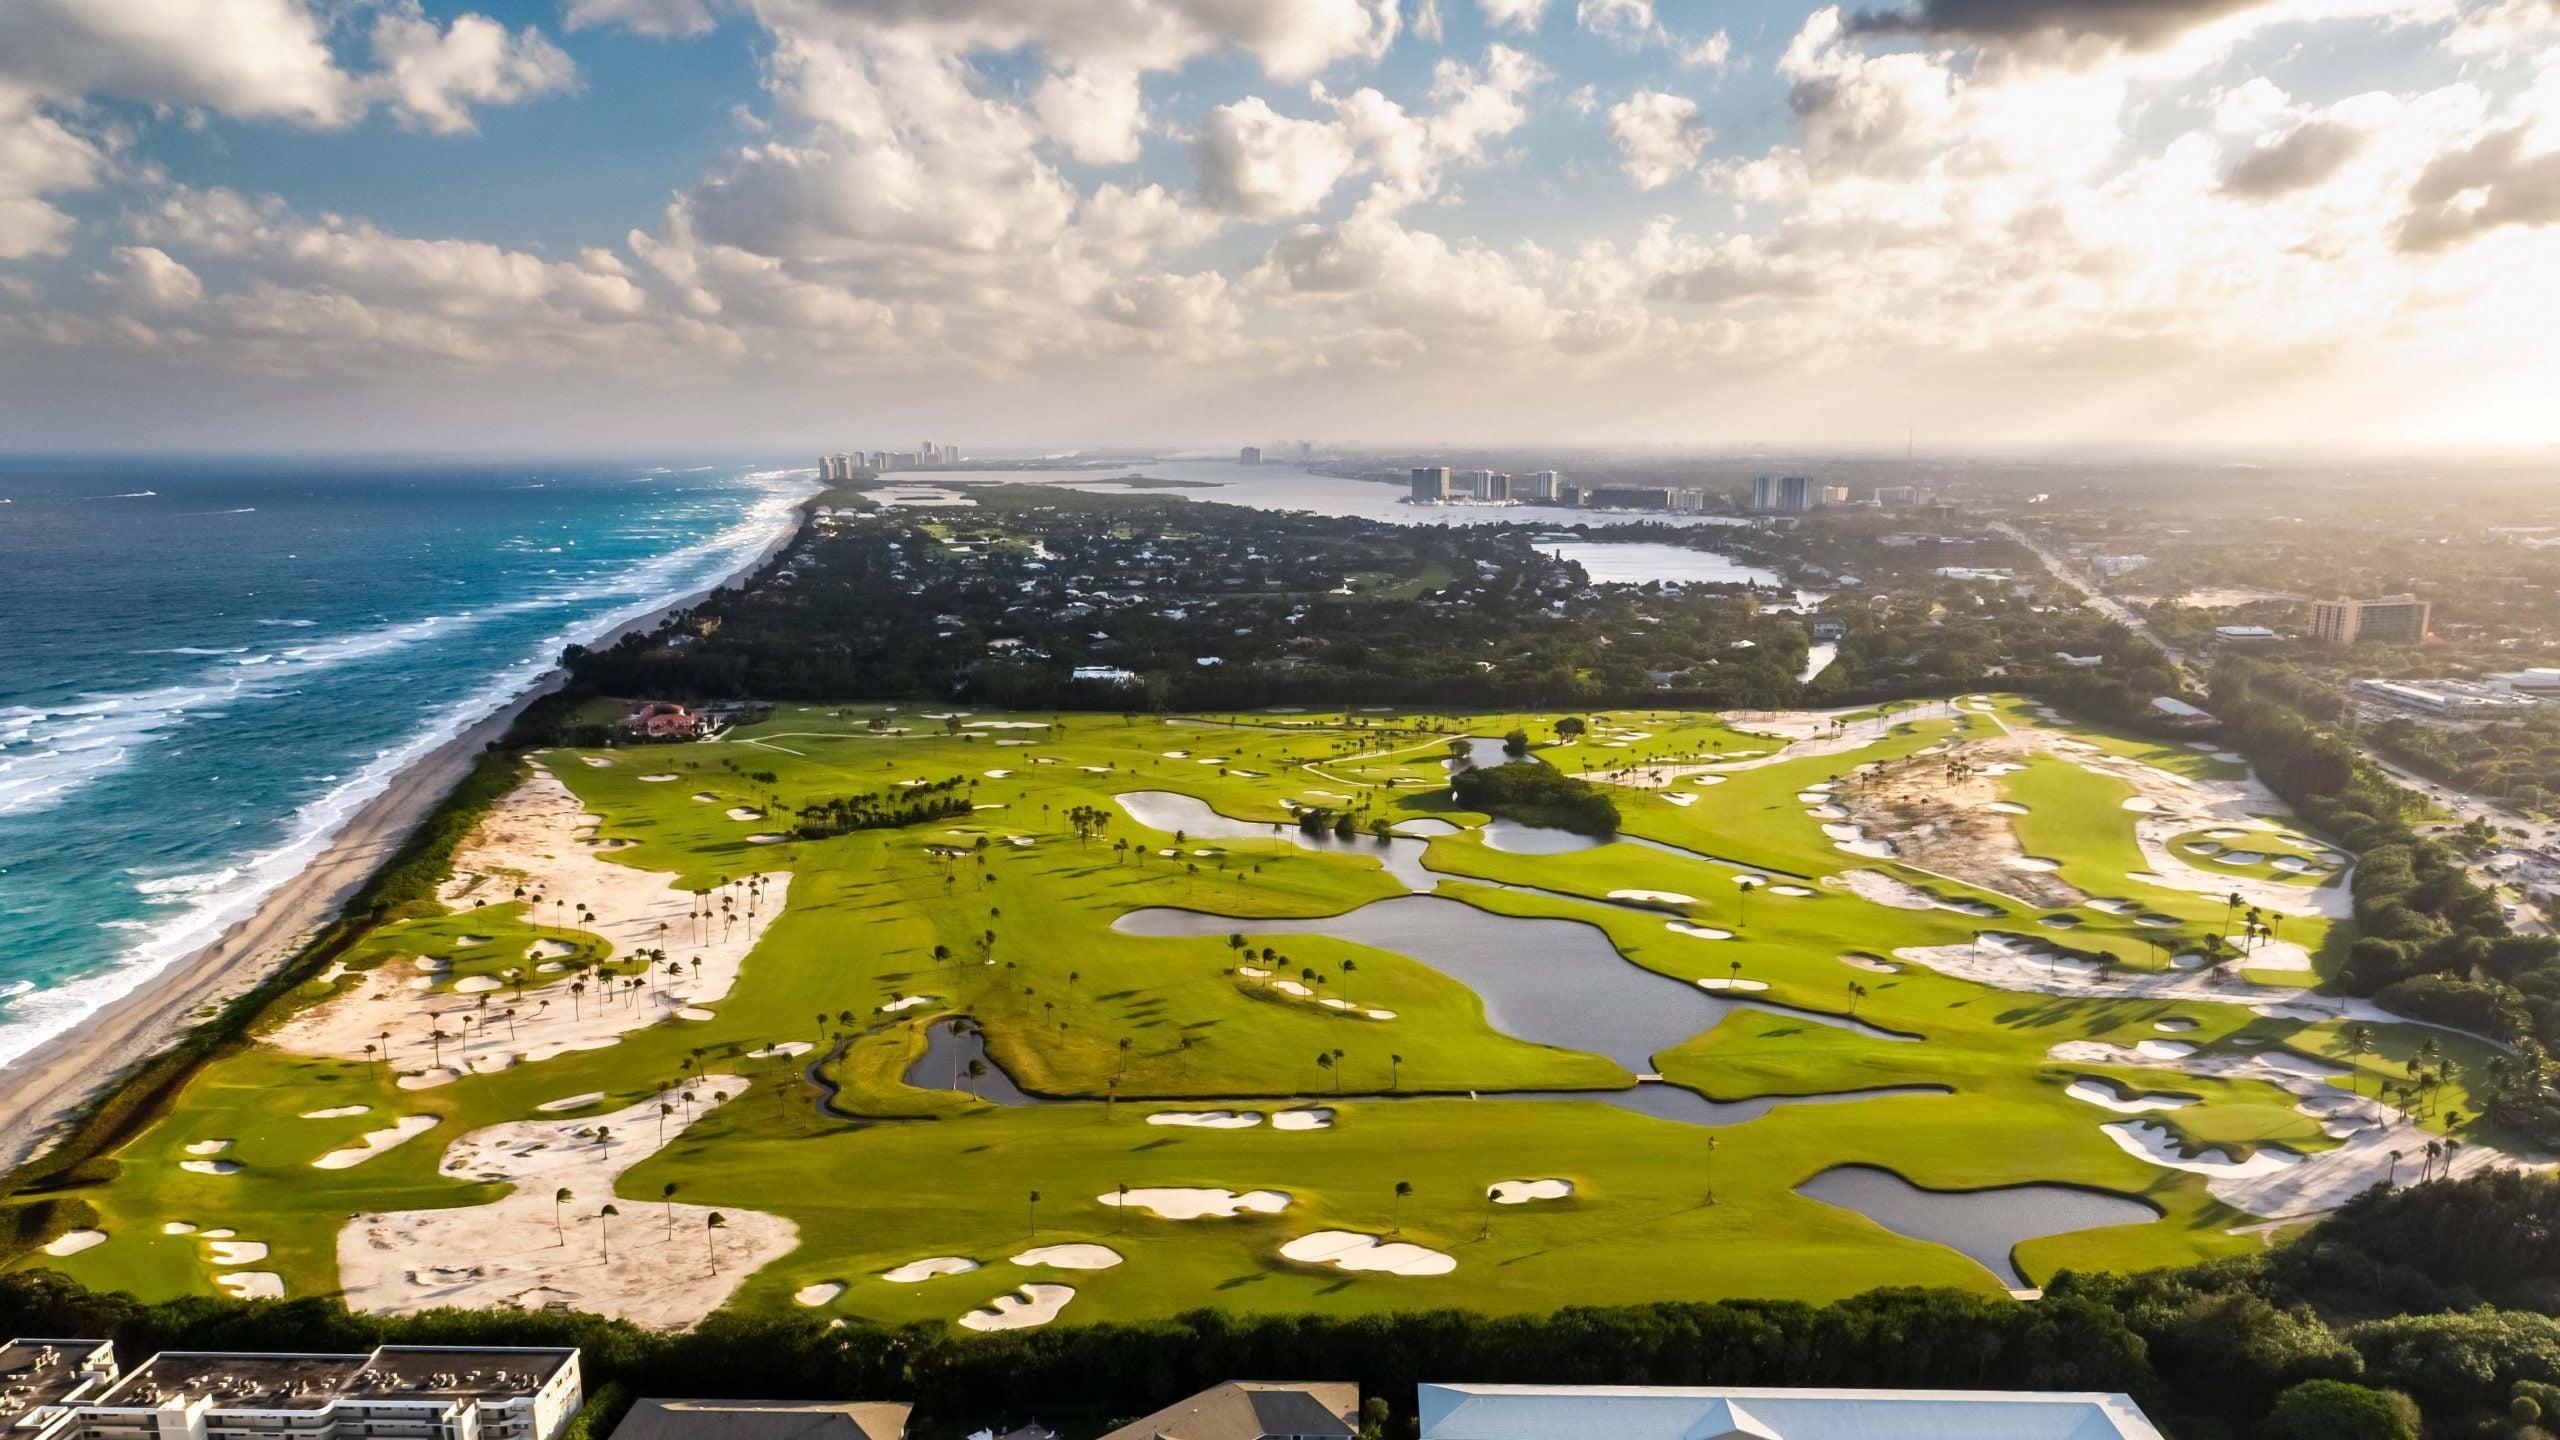 Aerial view of Seminole Golf Club